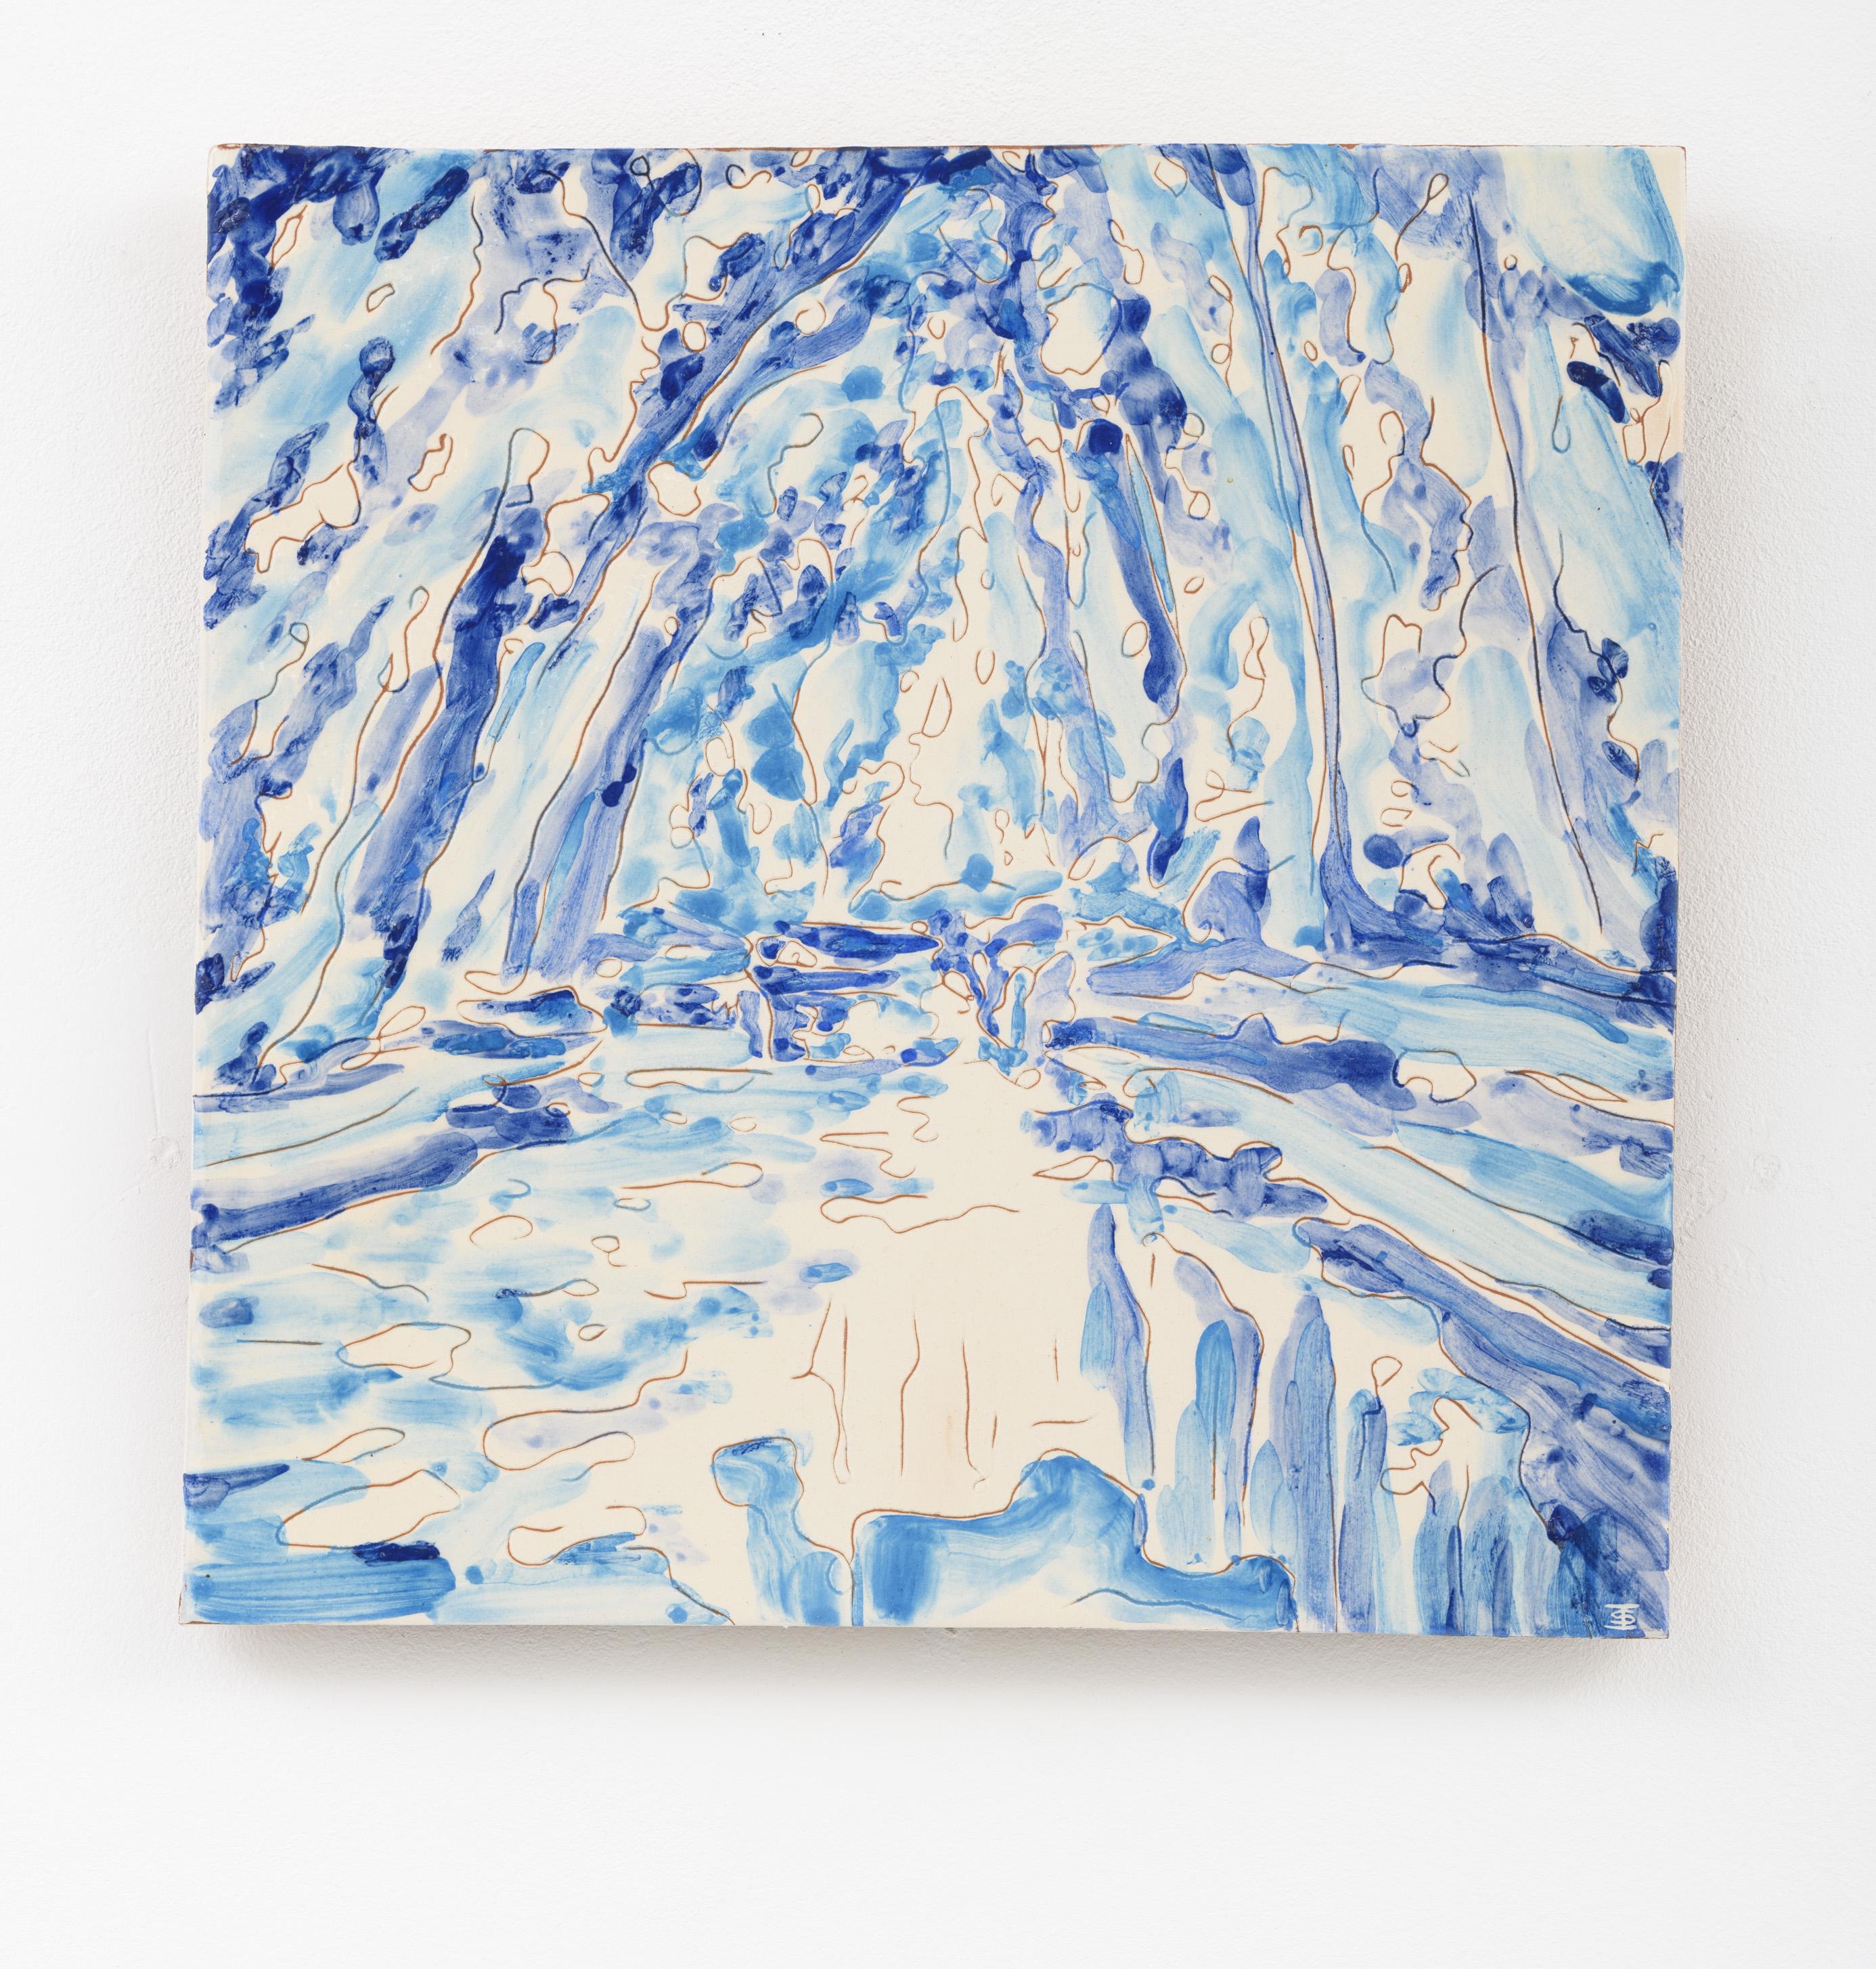 """O meu Alentejo VII"" 27,5 x 27,5 cm. painted ceramic tile Portugal 2015"